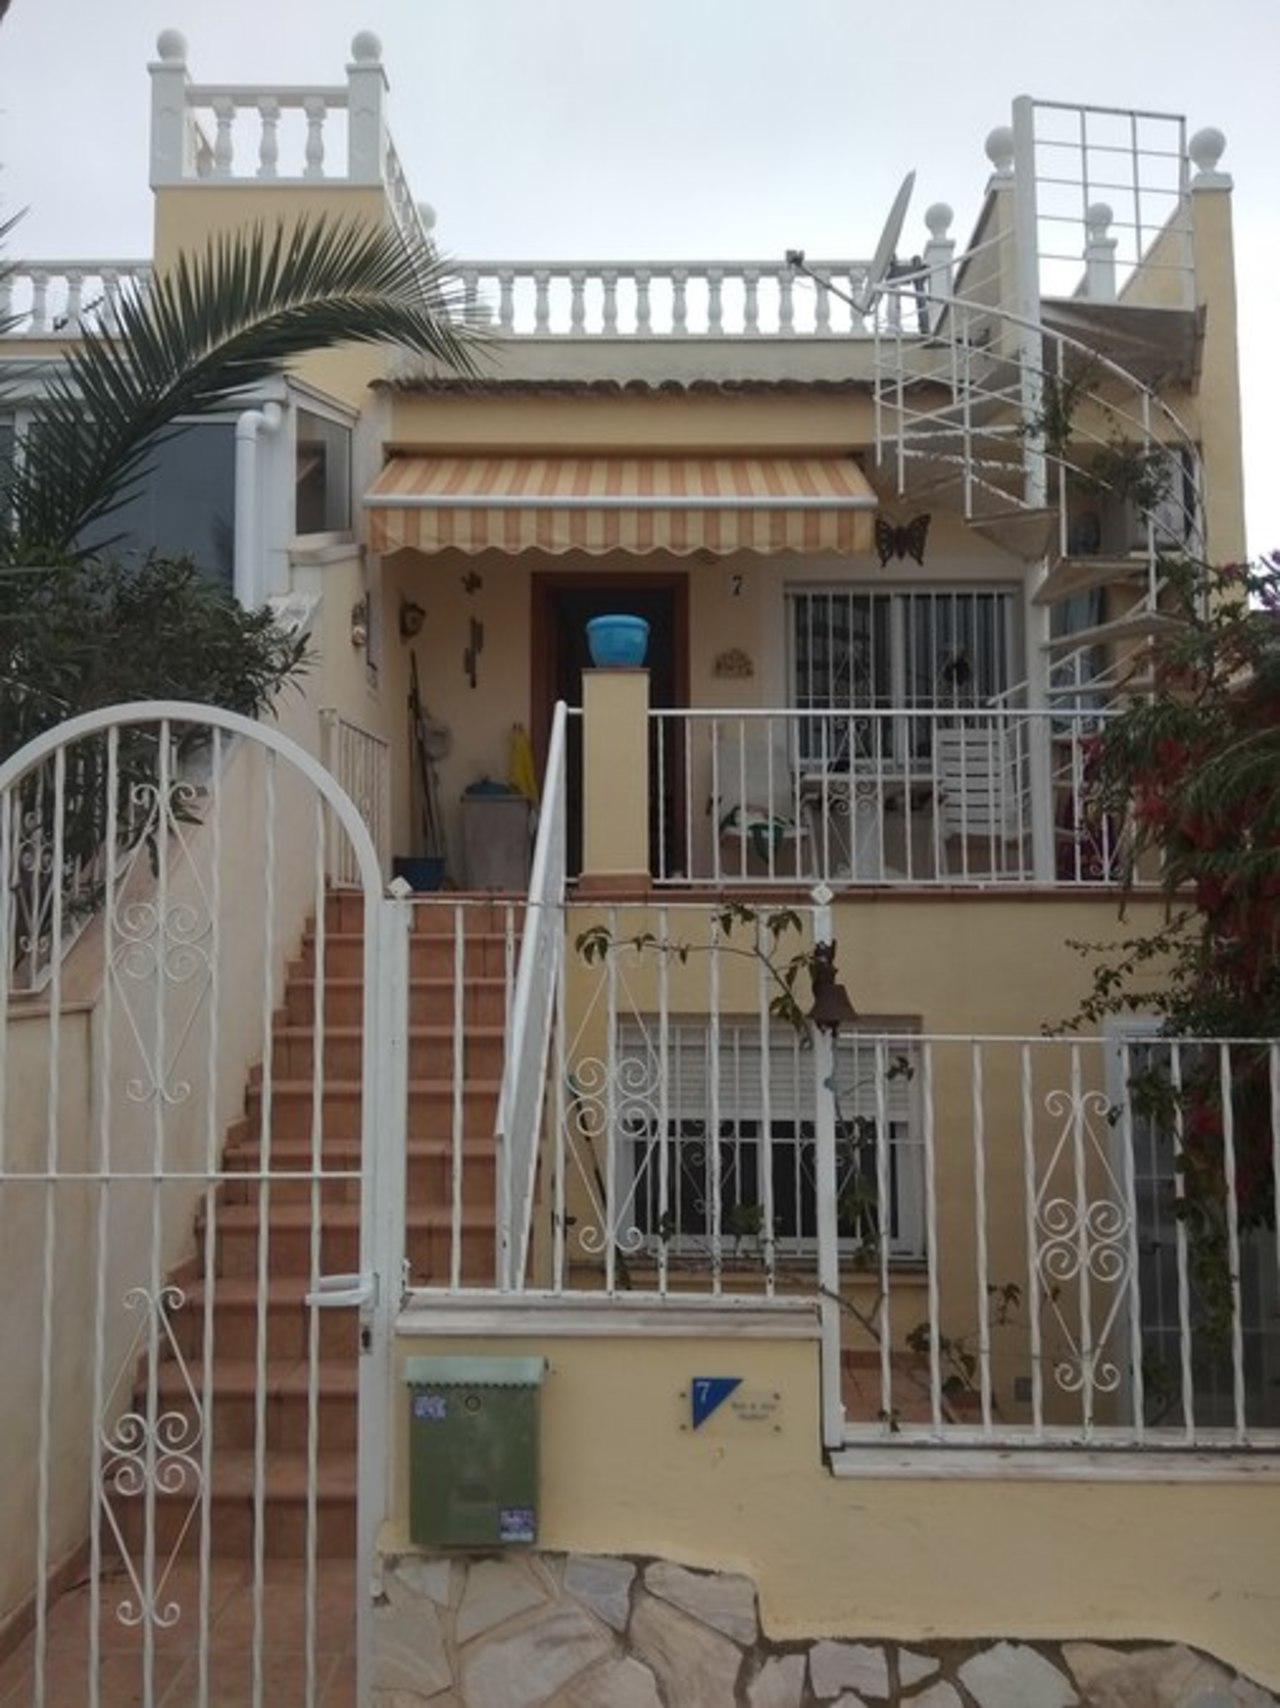 MPD93: Townhouse/Duplex for sale in Ciudad Quesada